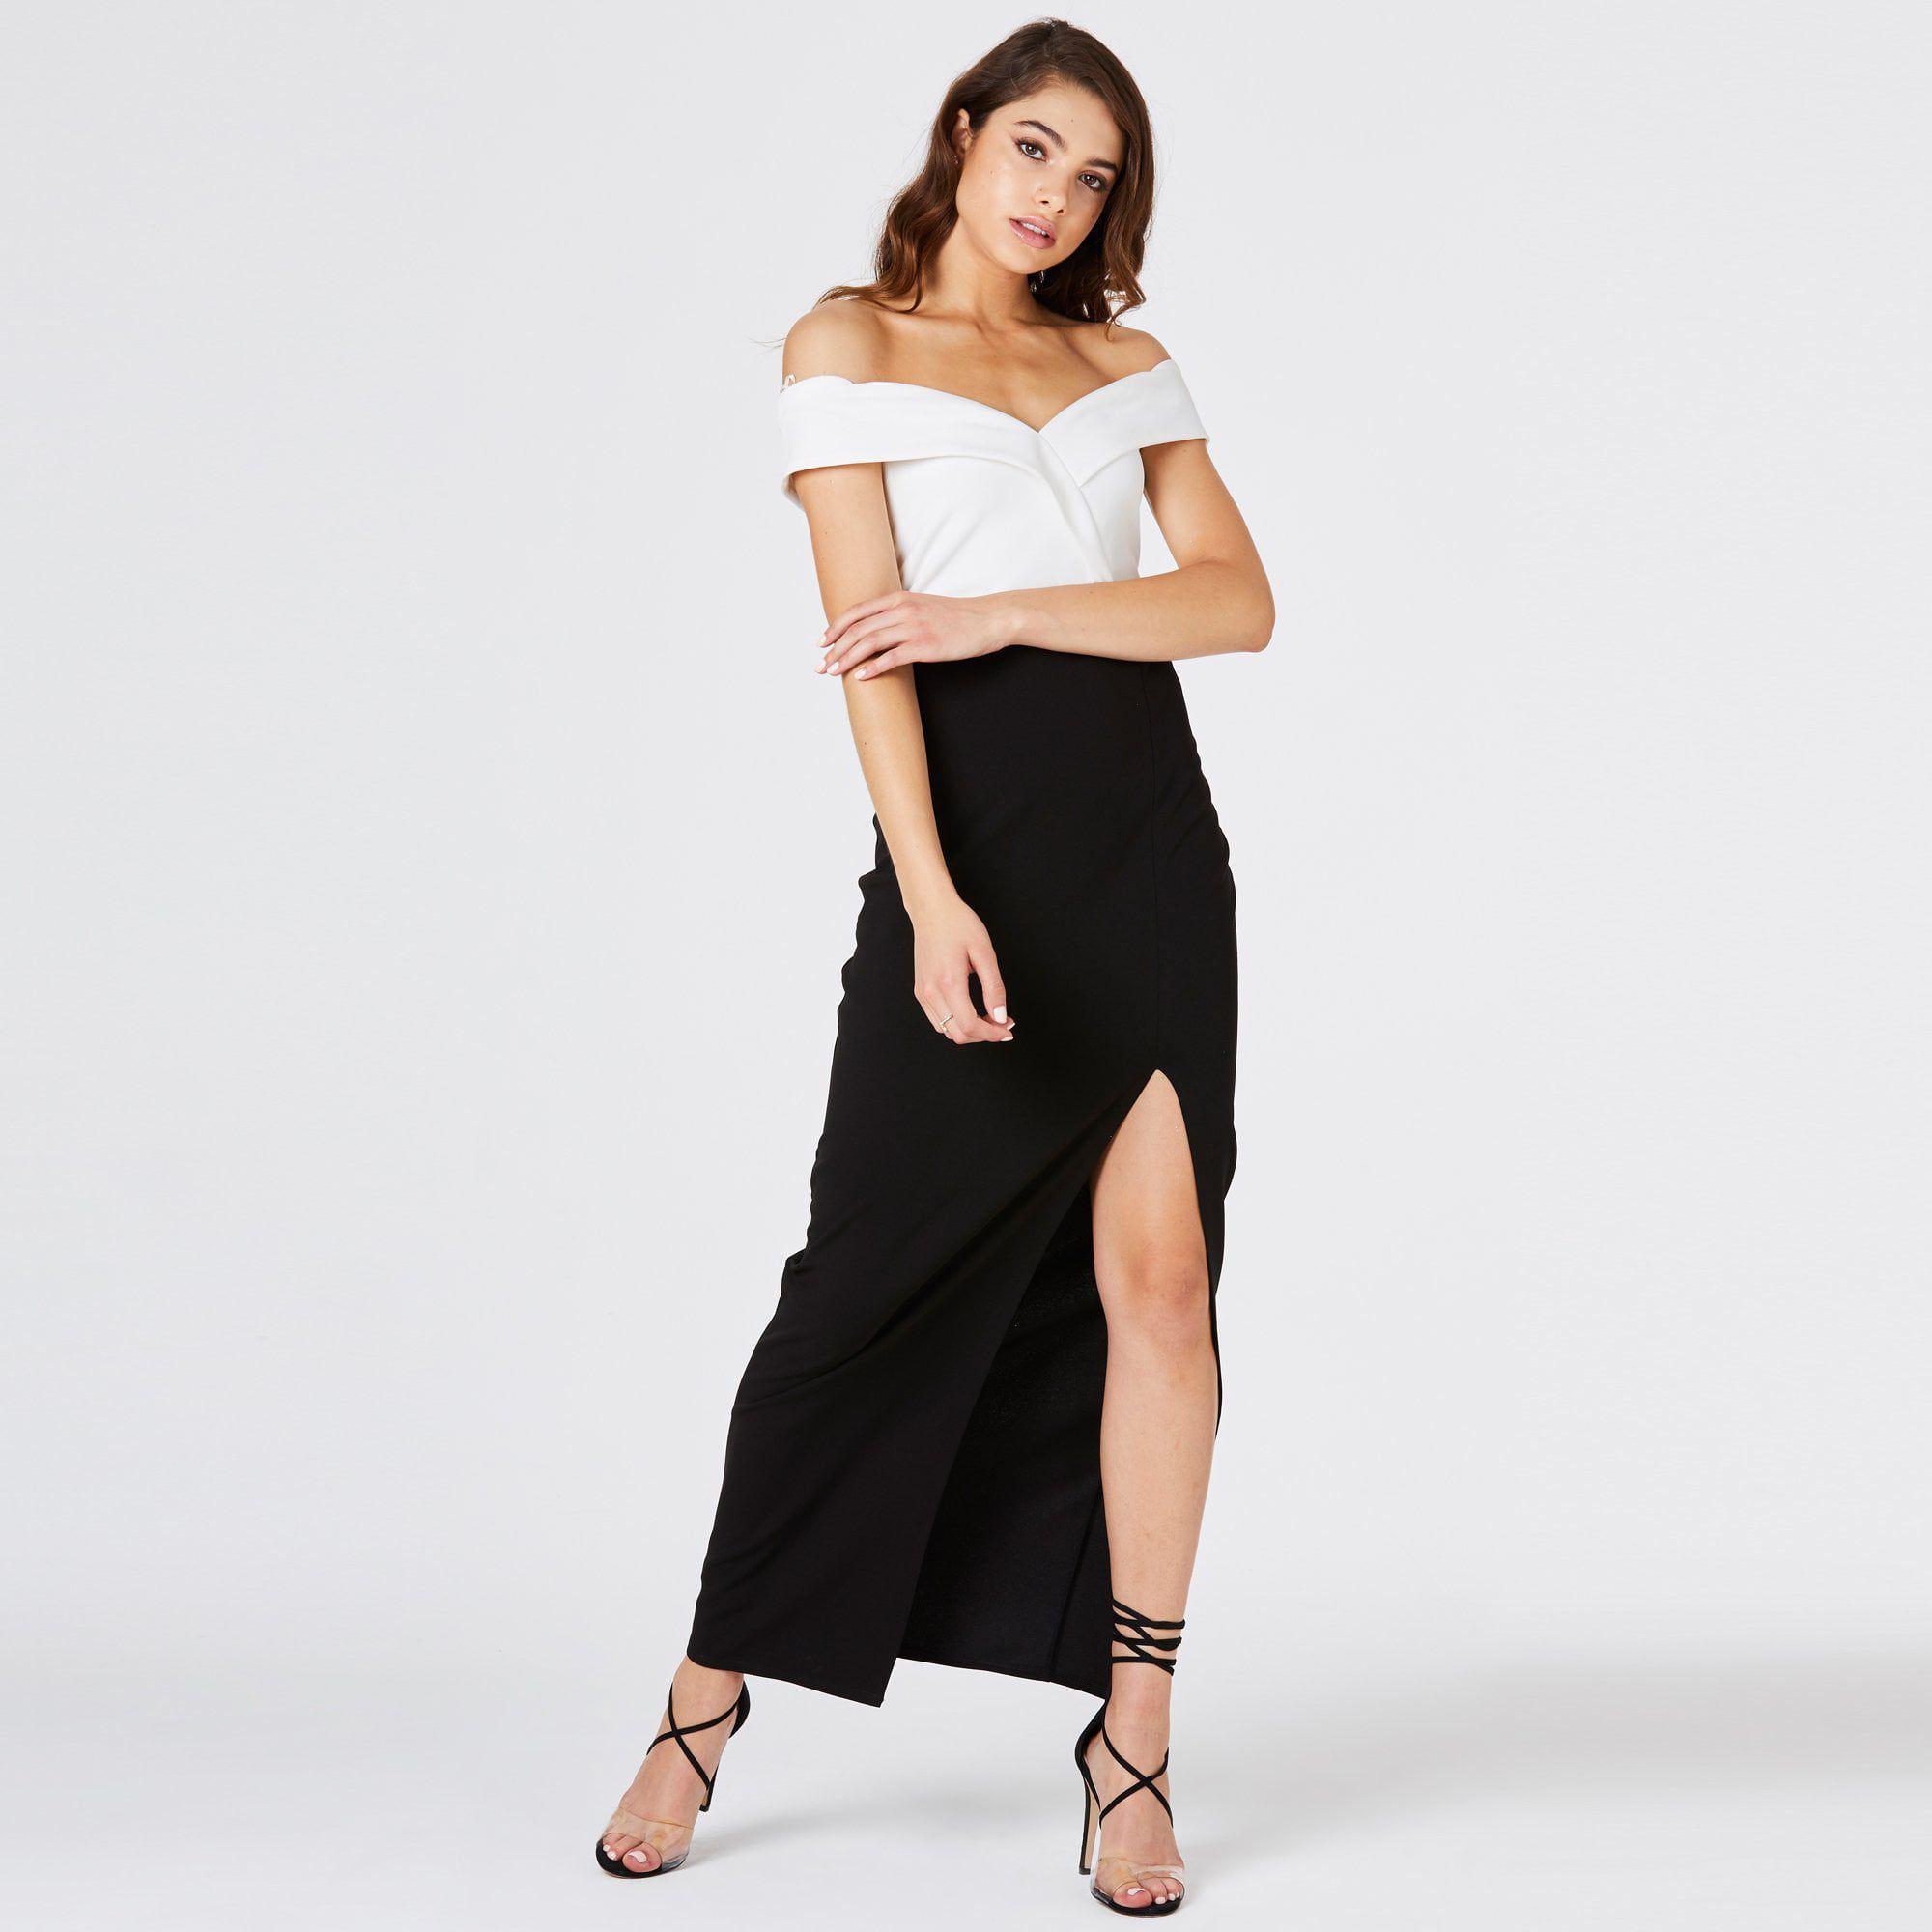 e7b320b16a8d Girls On Film Multicoloured Pose Foldover Bardot Maxi Dress in Black ...